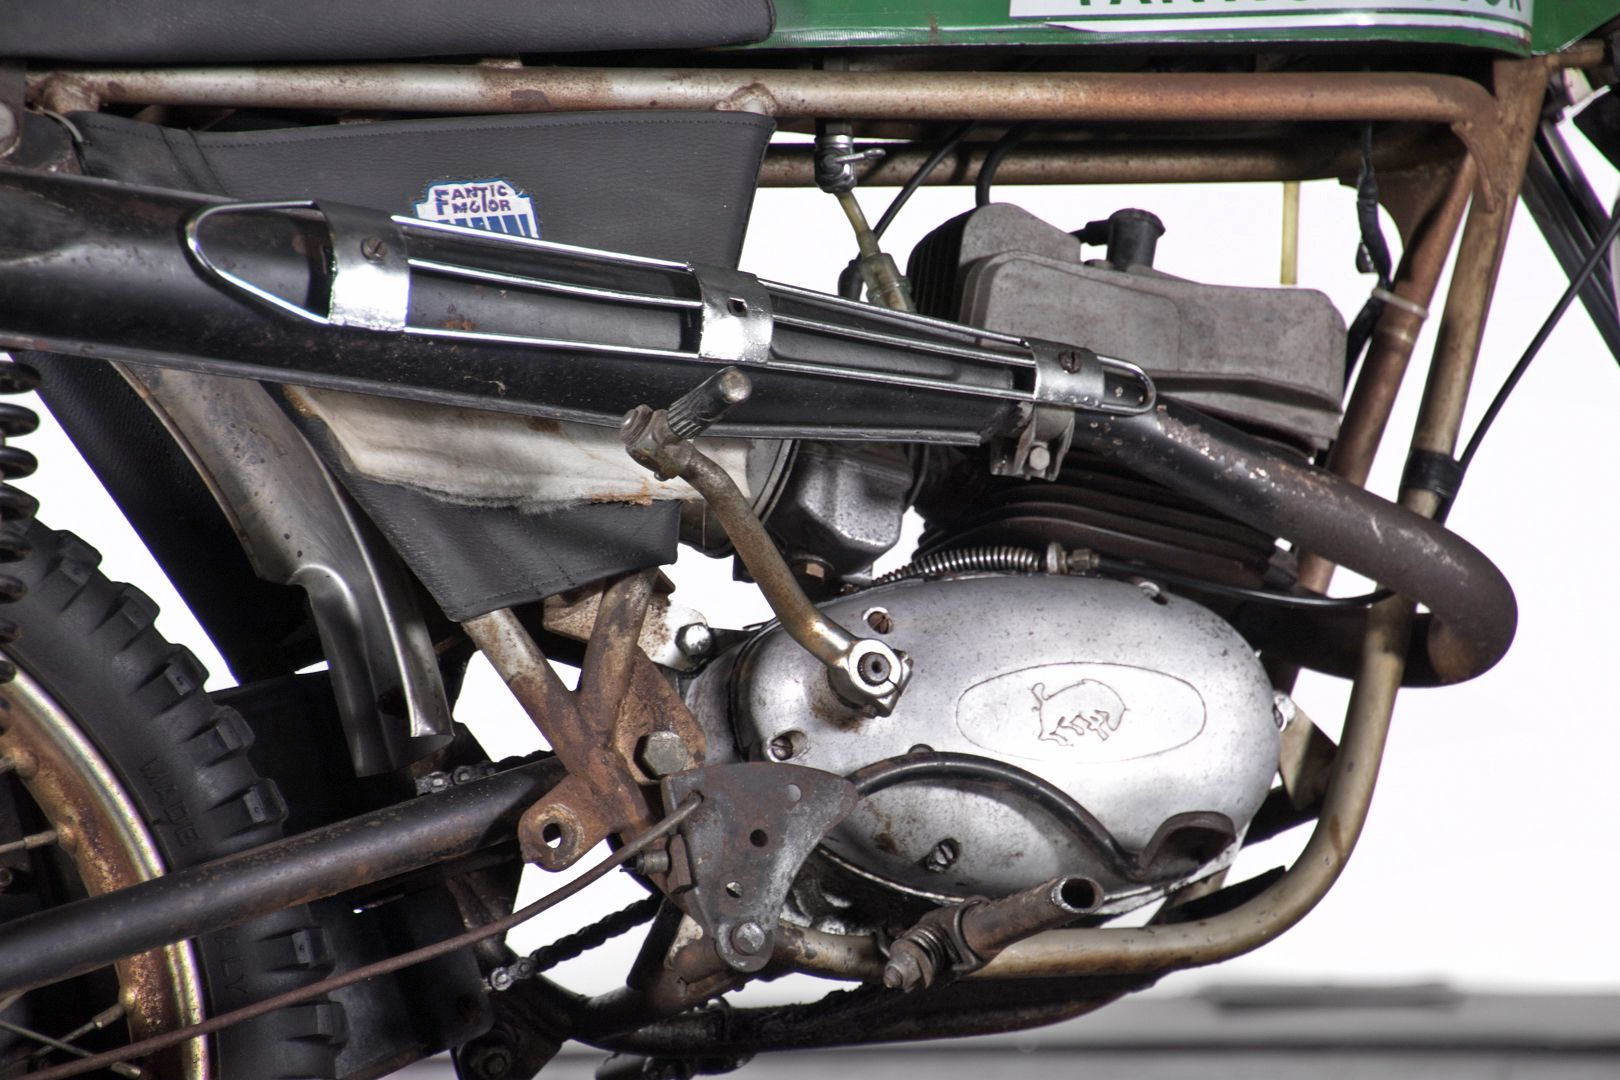 1971 FANTIC MOTOR CABALLERO 100 CROSS TX92 53154